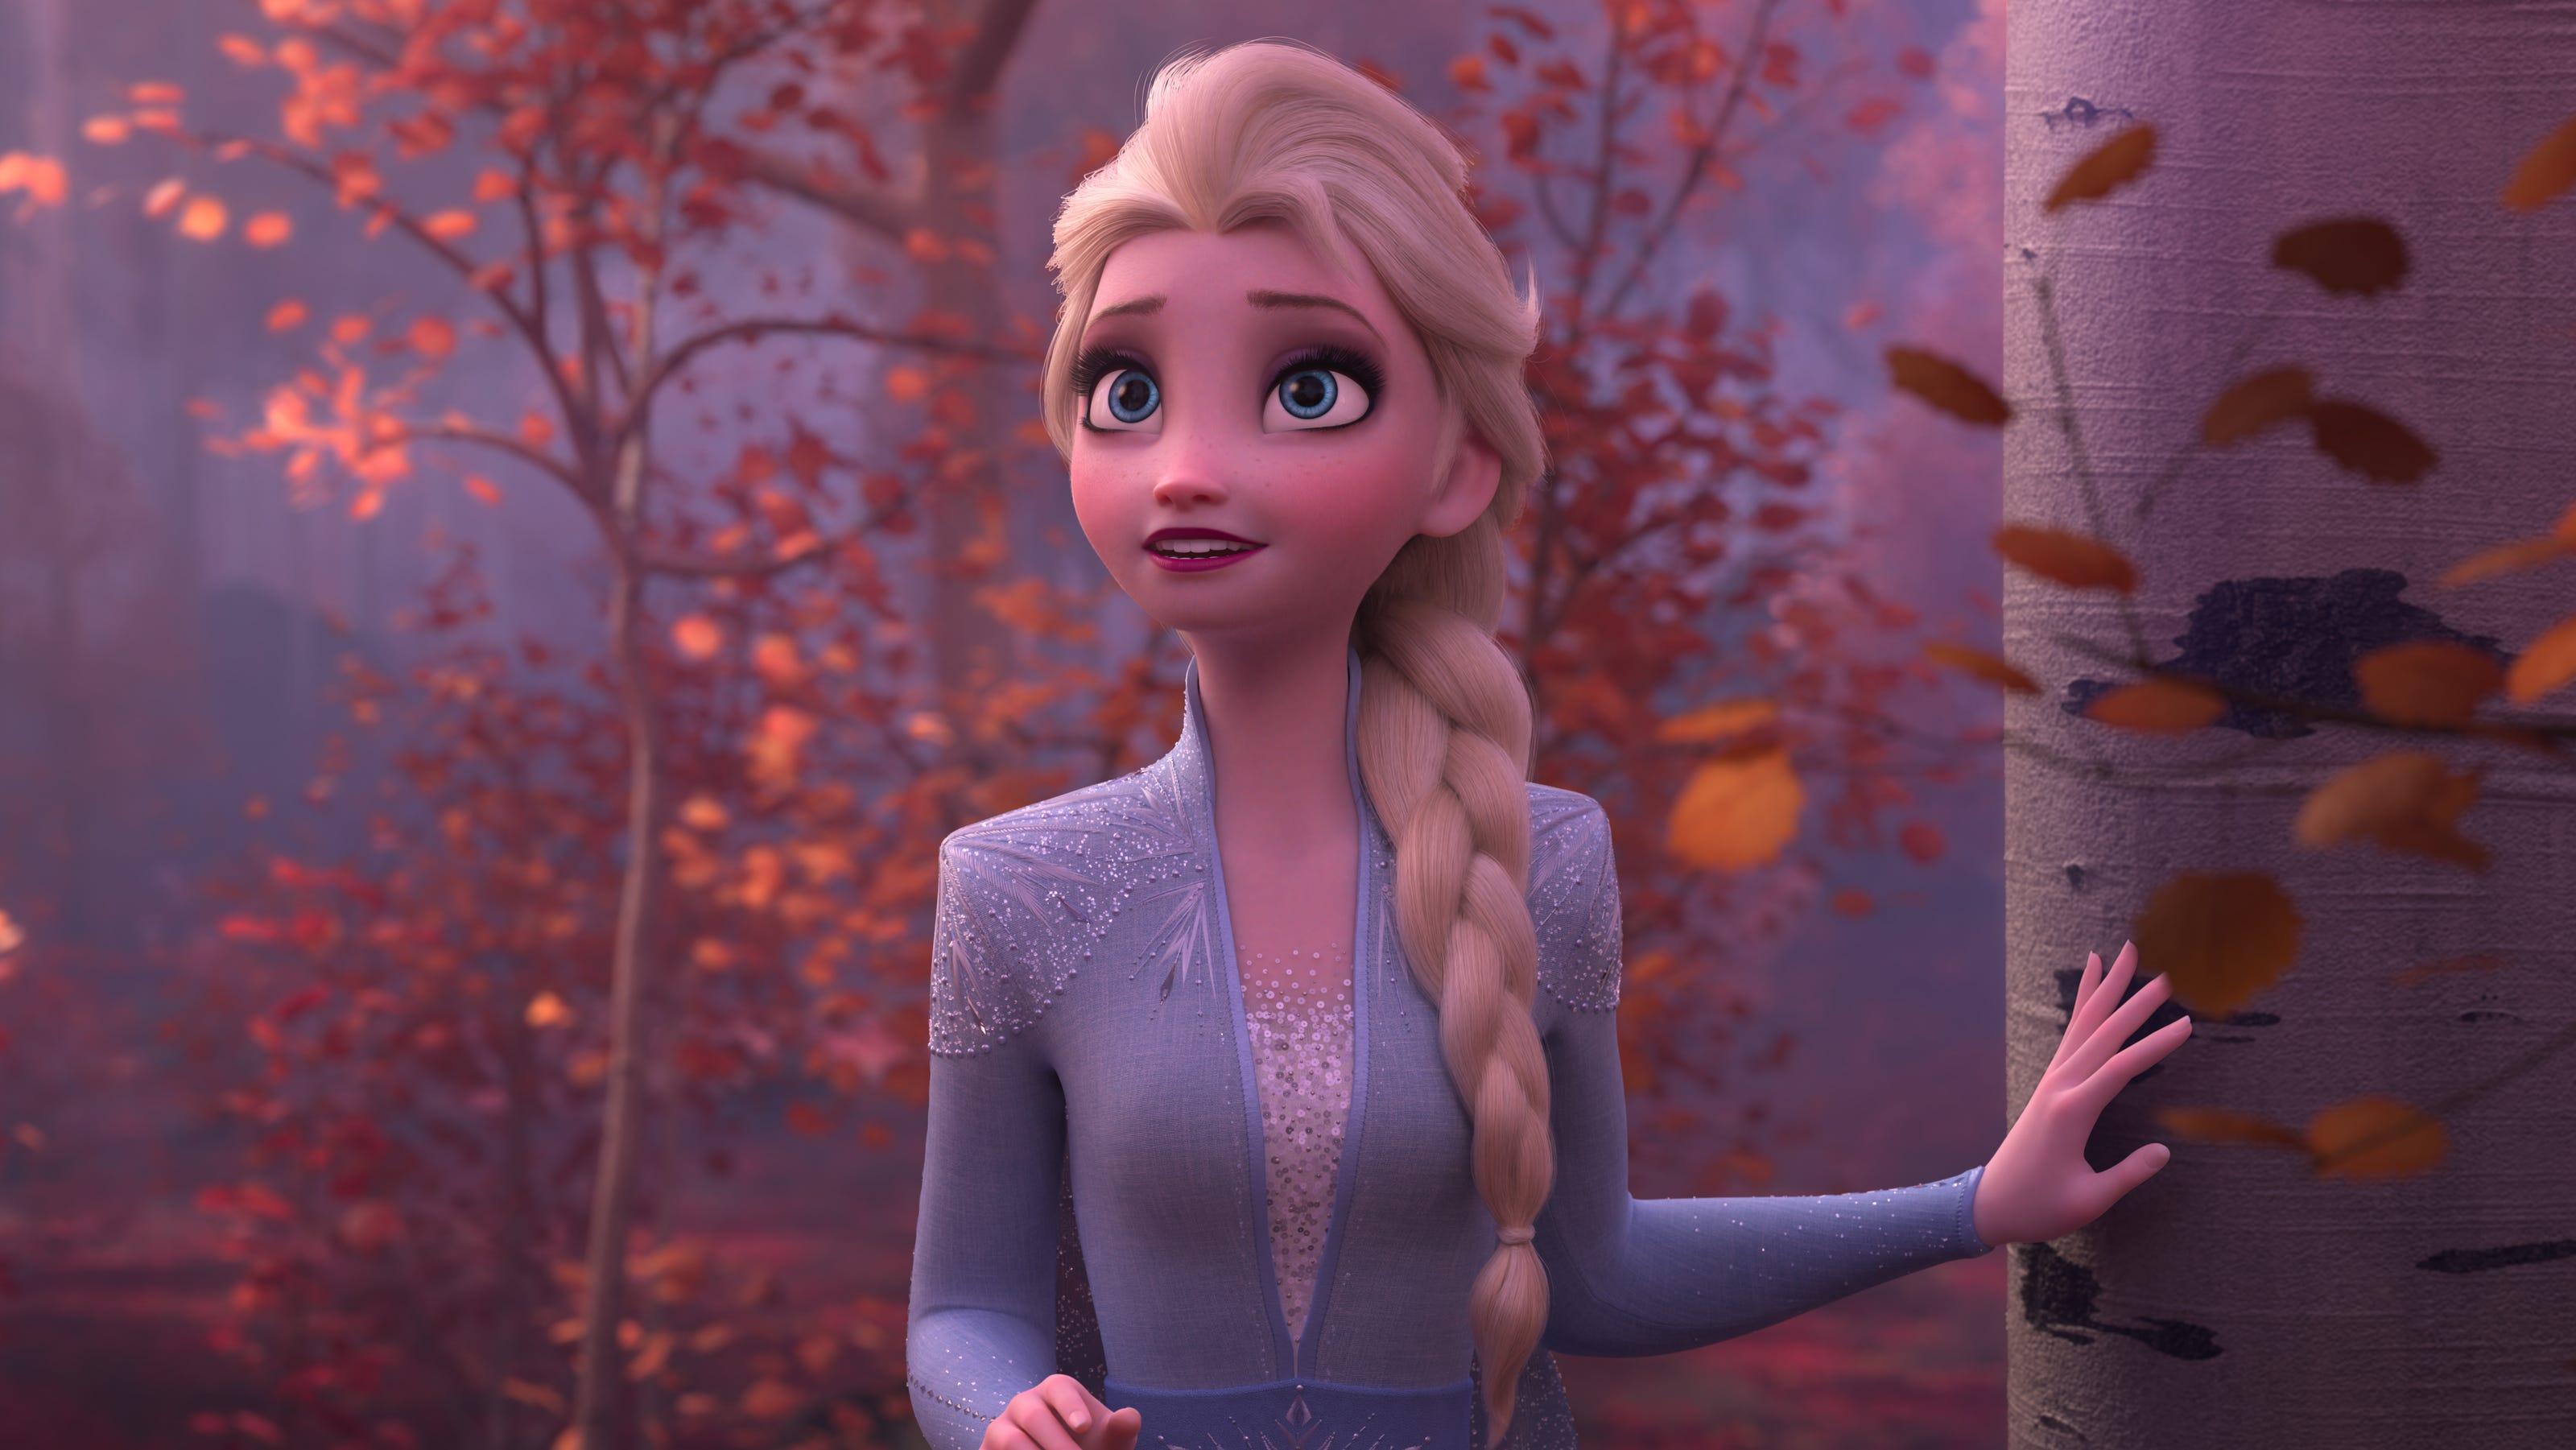 Frozen 2 Spoilers Anna Elsa Embrace New Roles In Disney Sequel